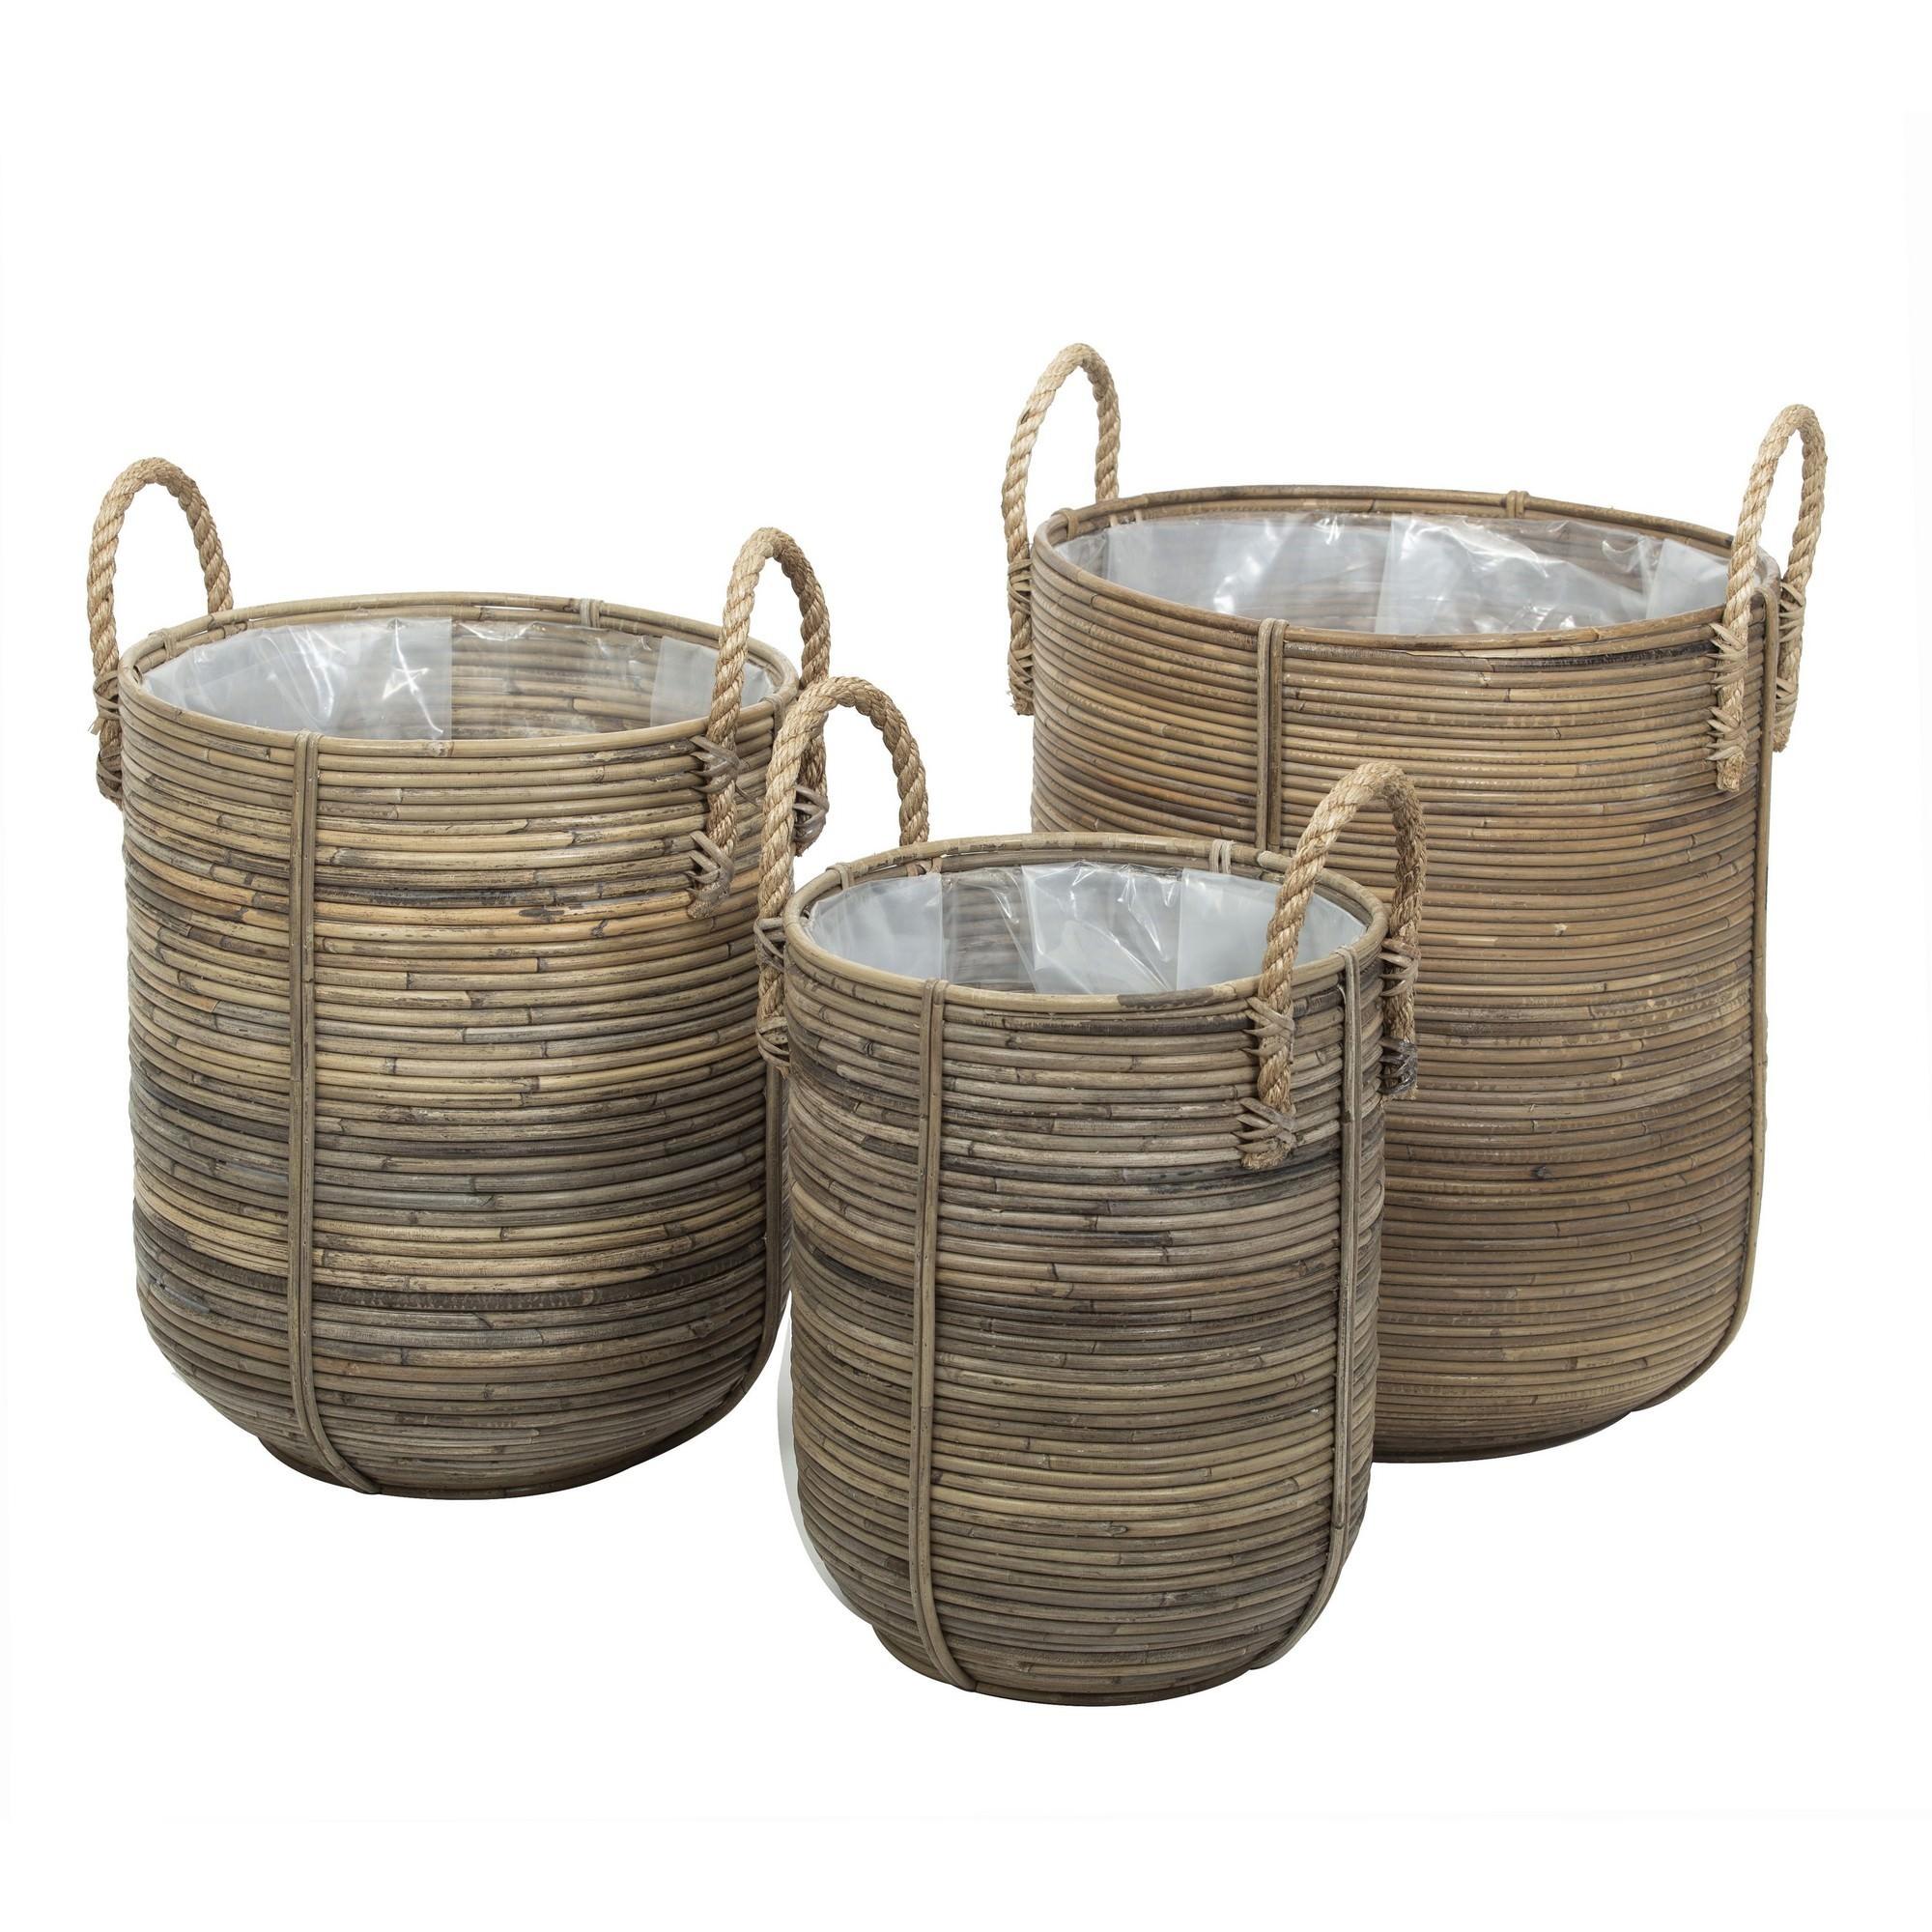 Ryland 3 Piece Bamboo Rattan Round Basket Set